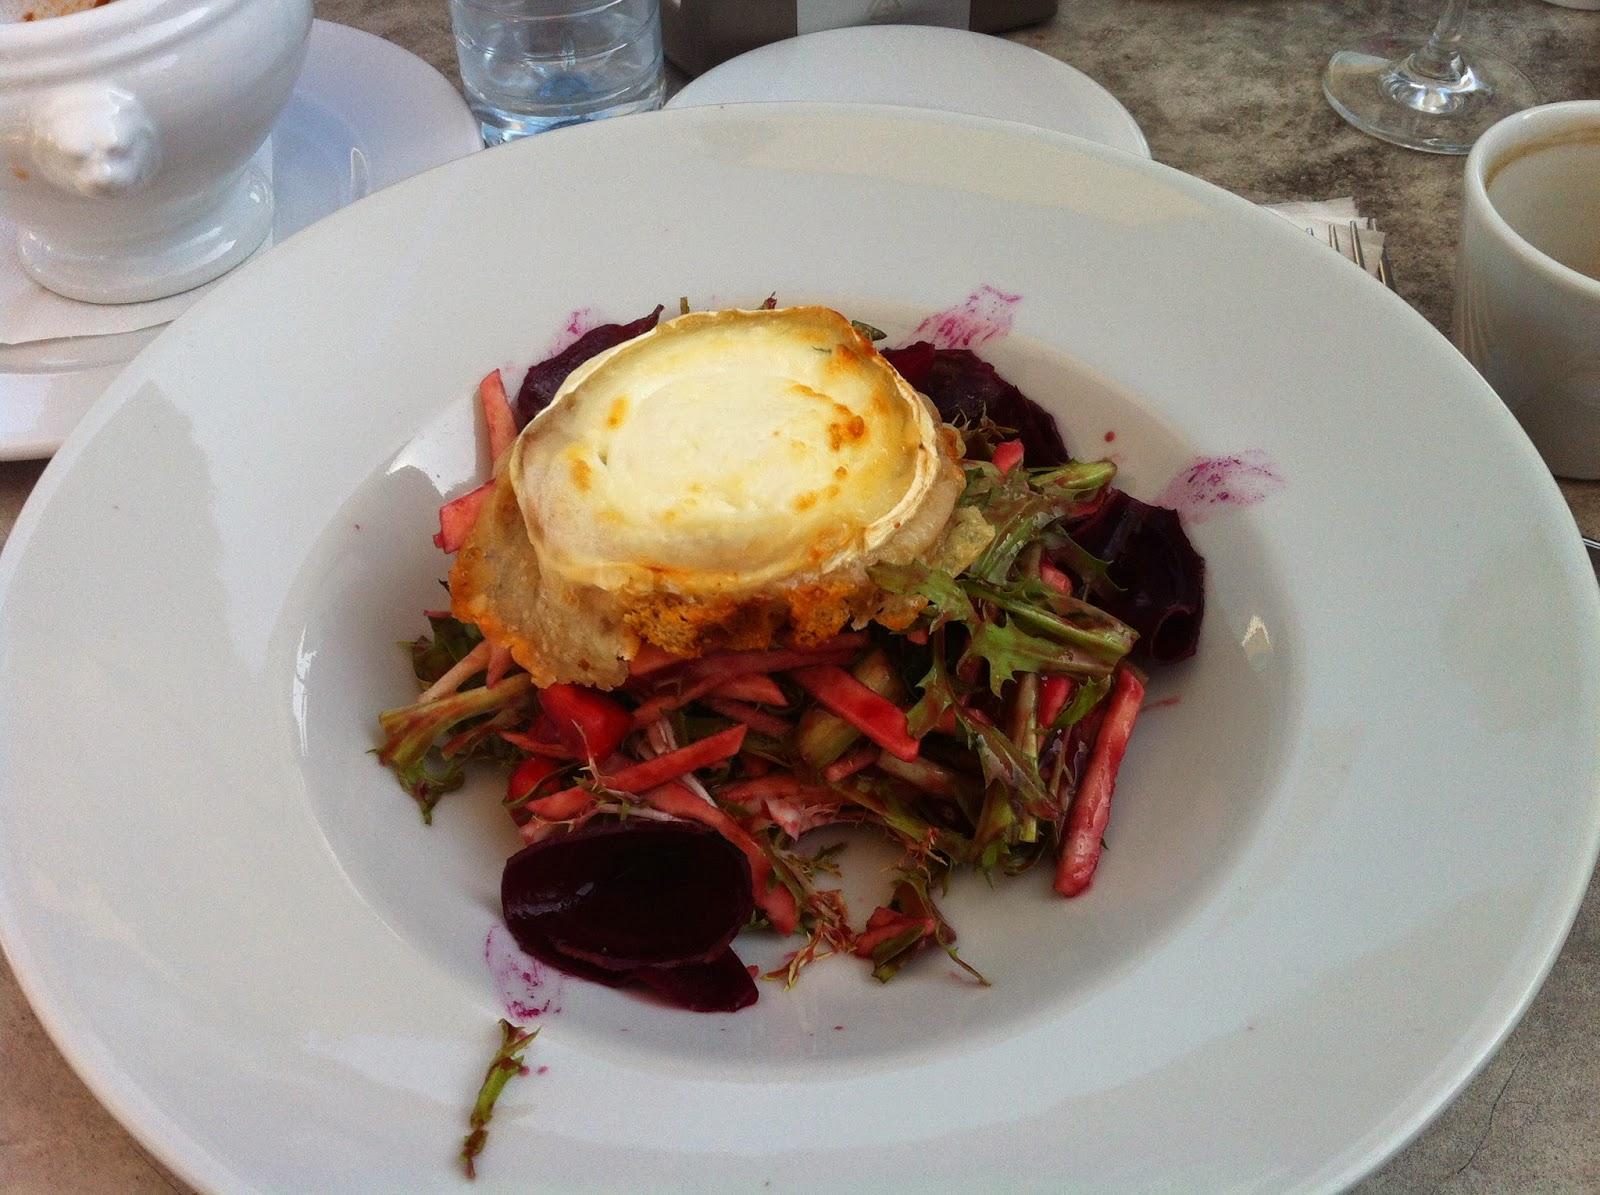 beet salad from Bona in Trakai